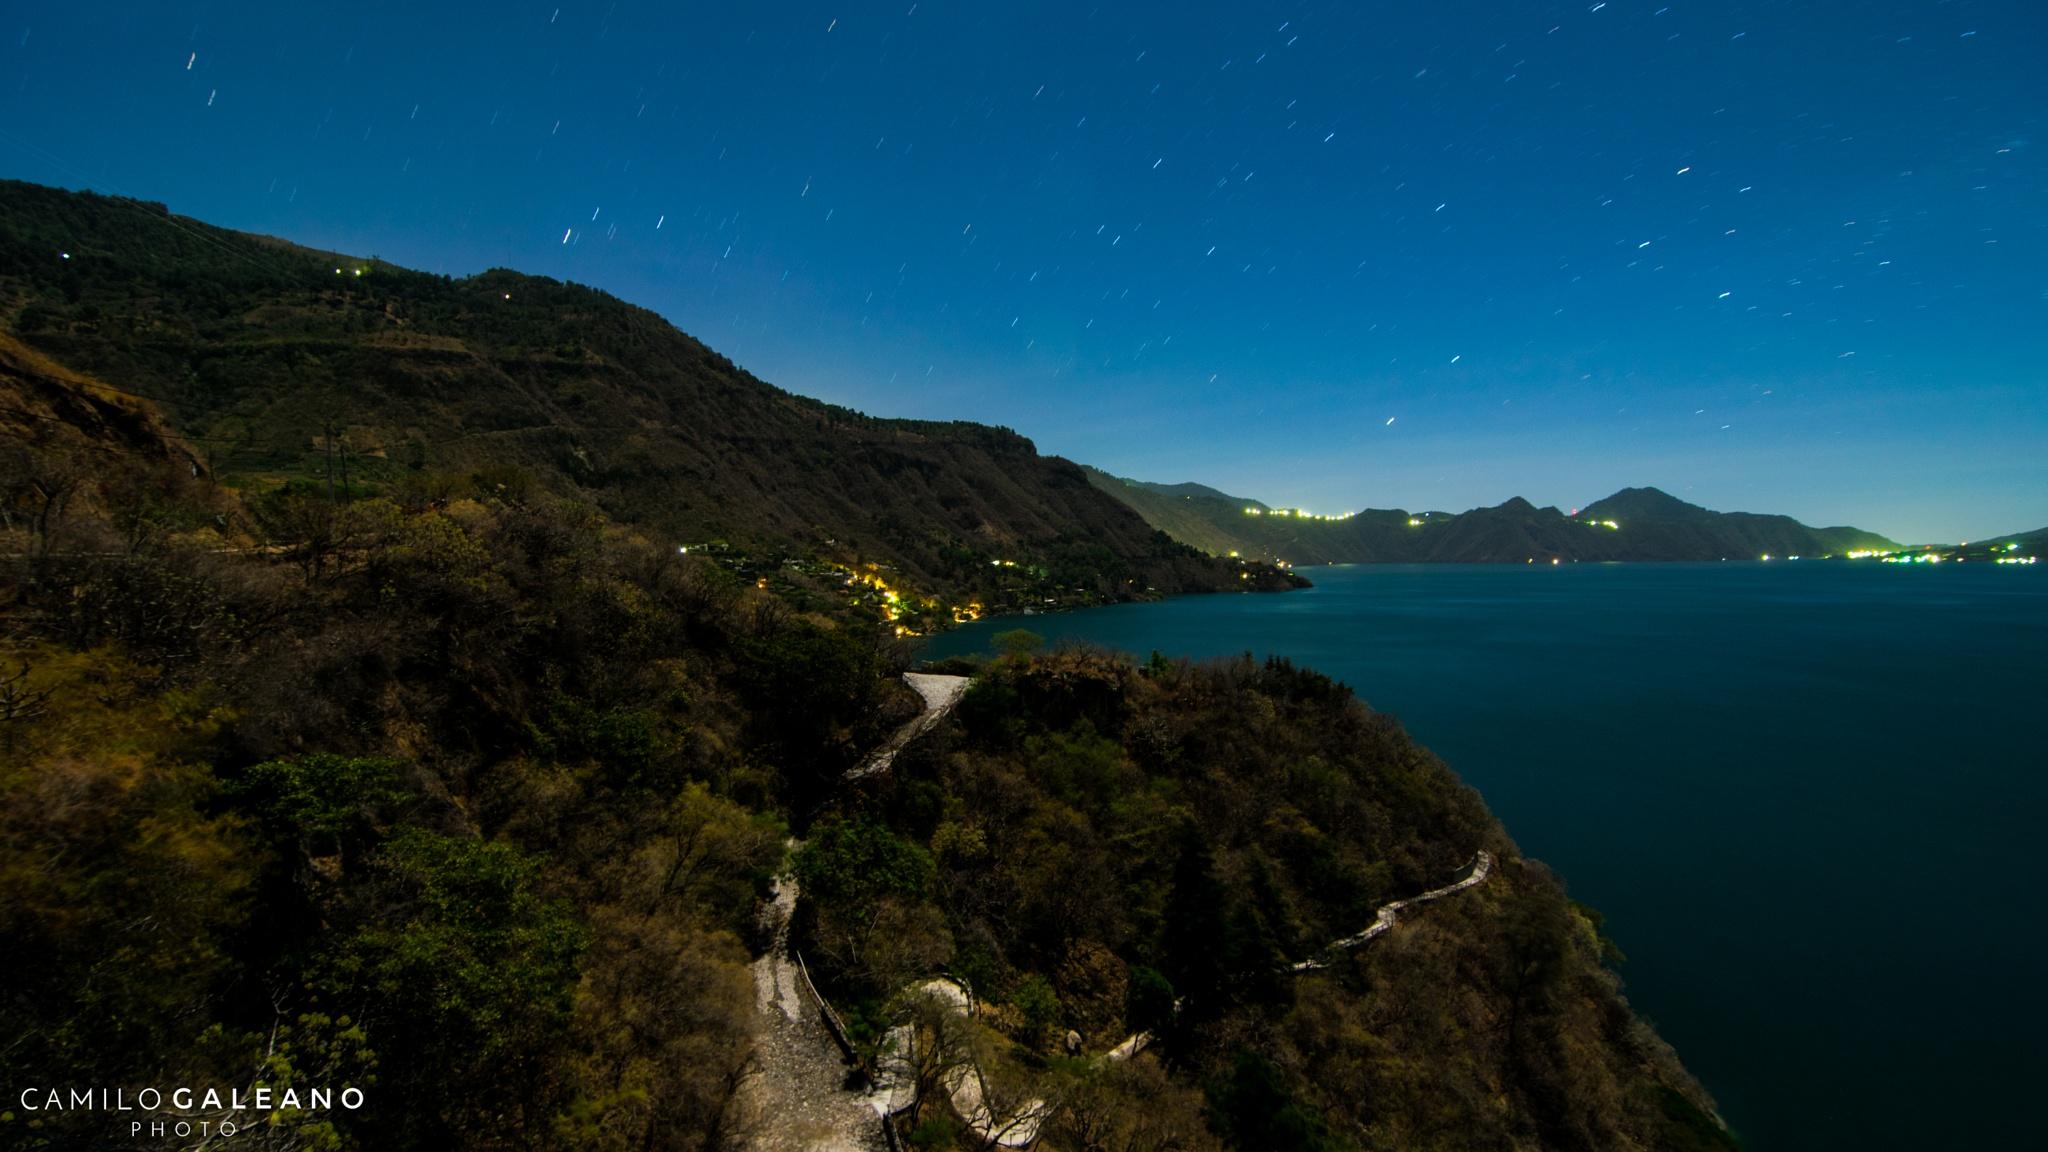 Bright night by Camilo Galeano